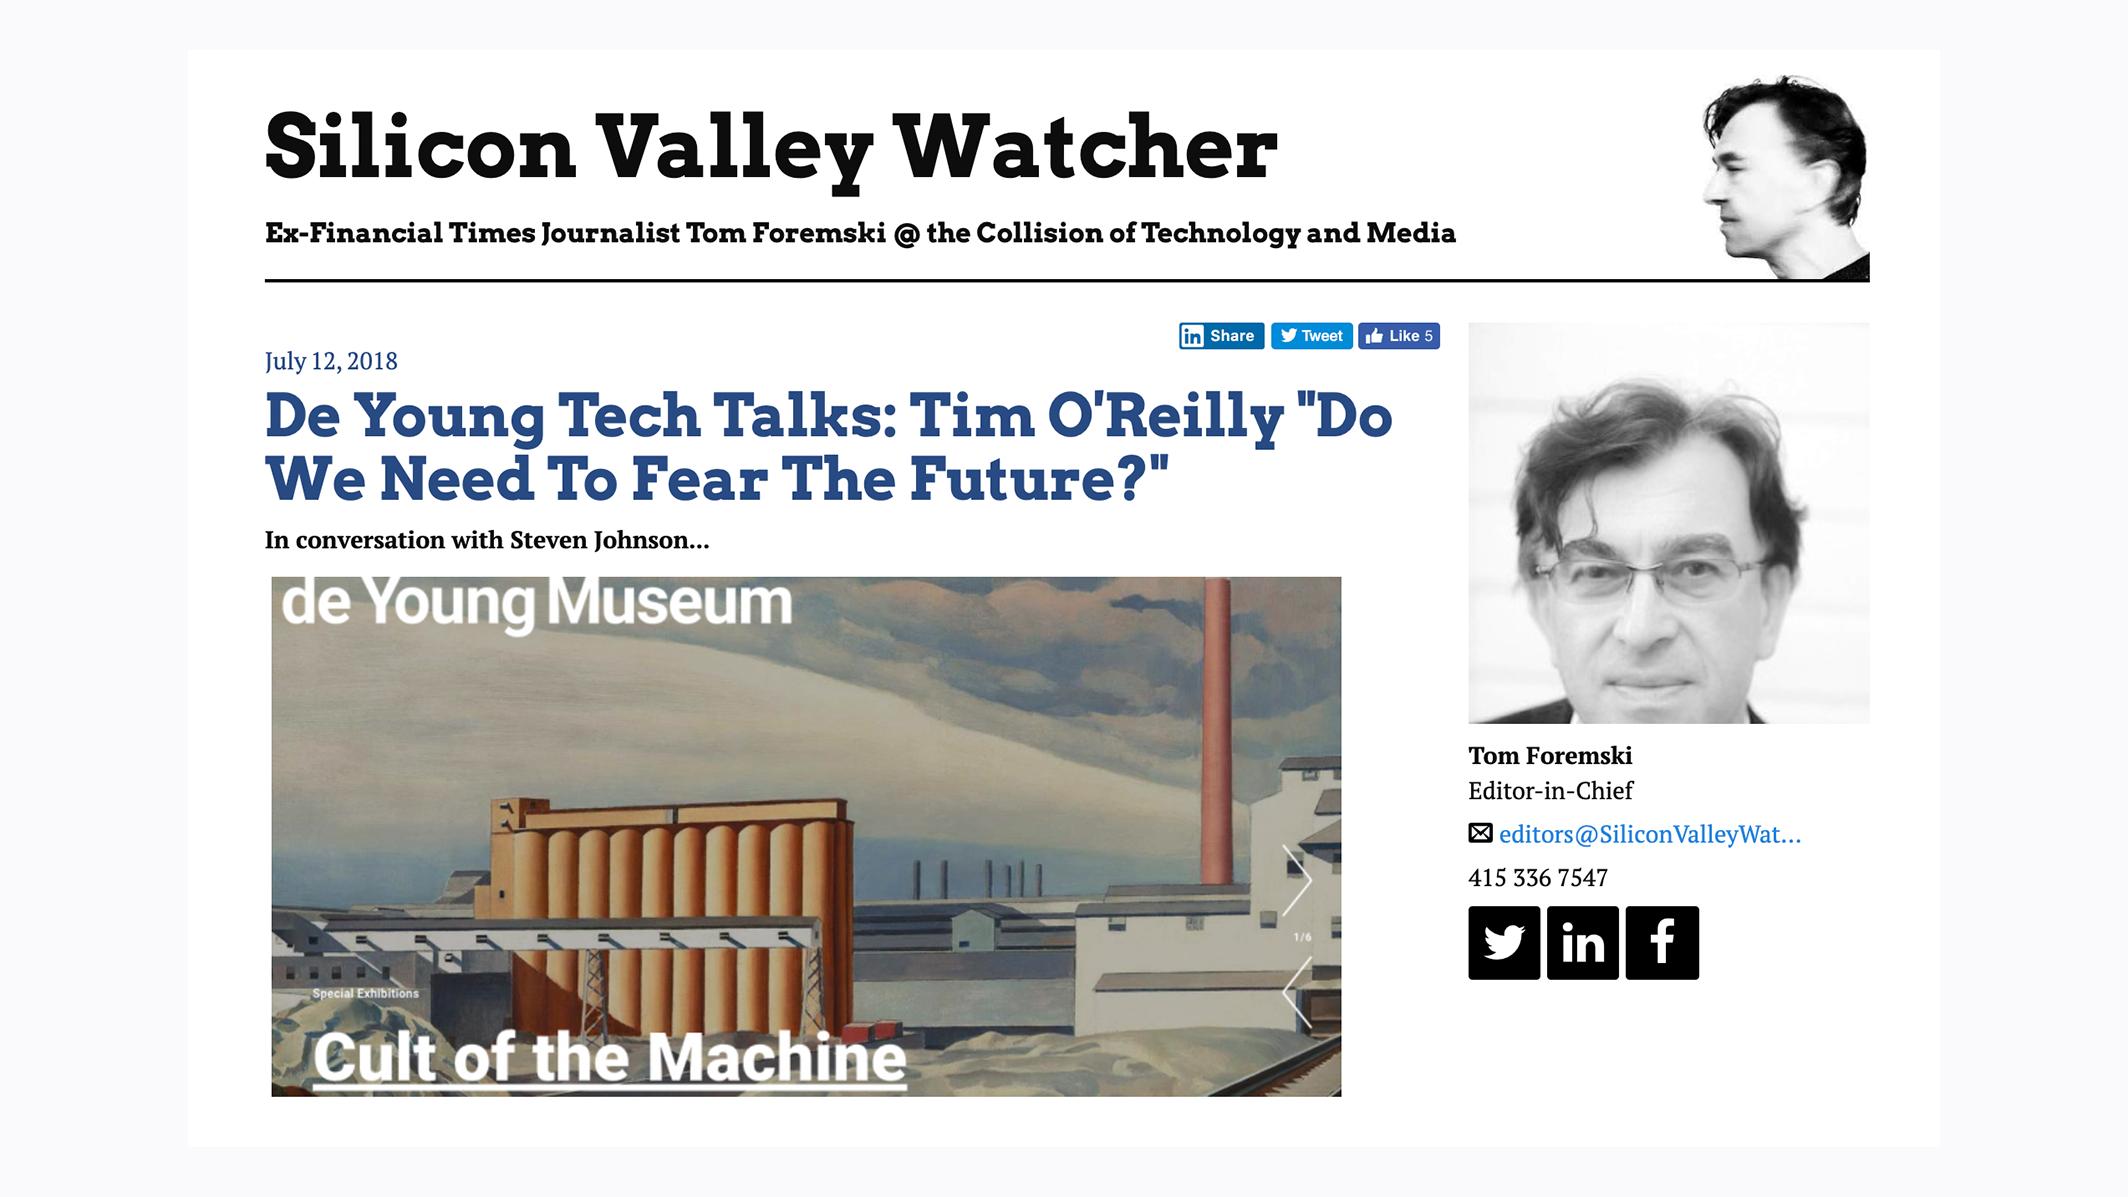 Tom's story on Tim O'Reilly talk